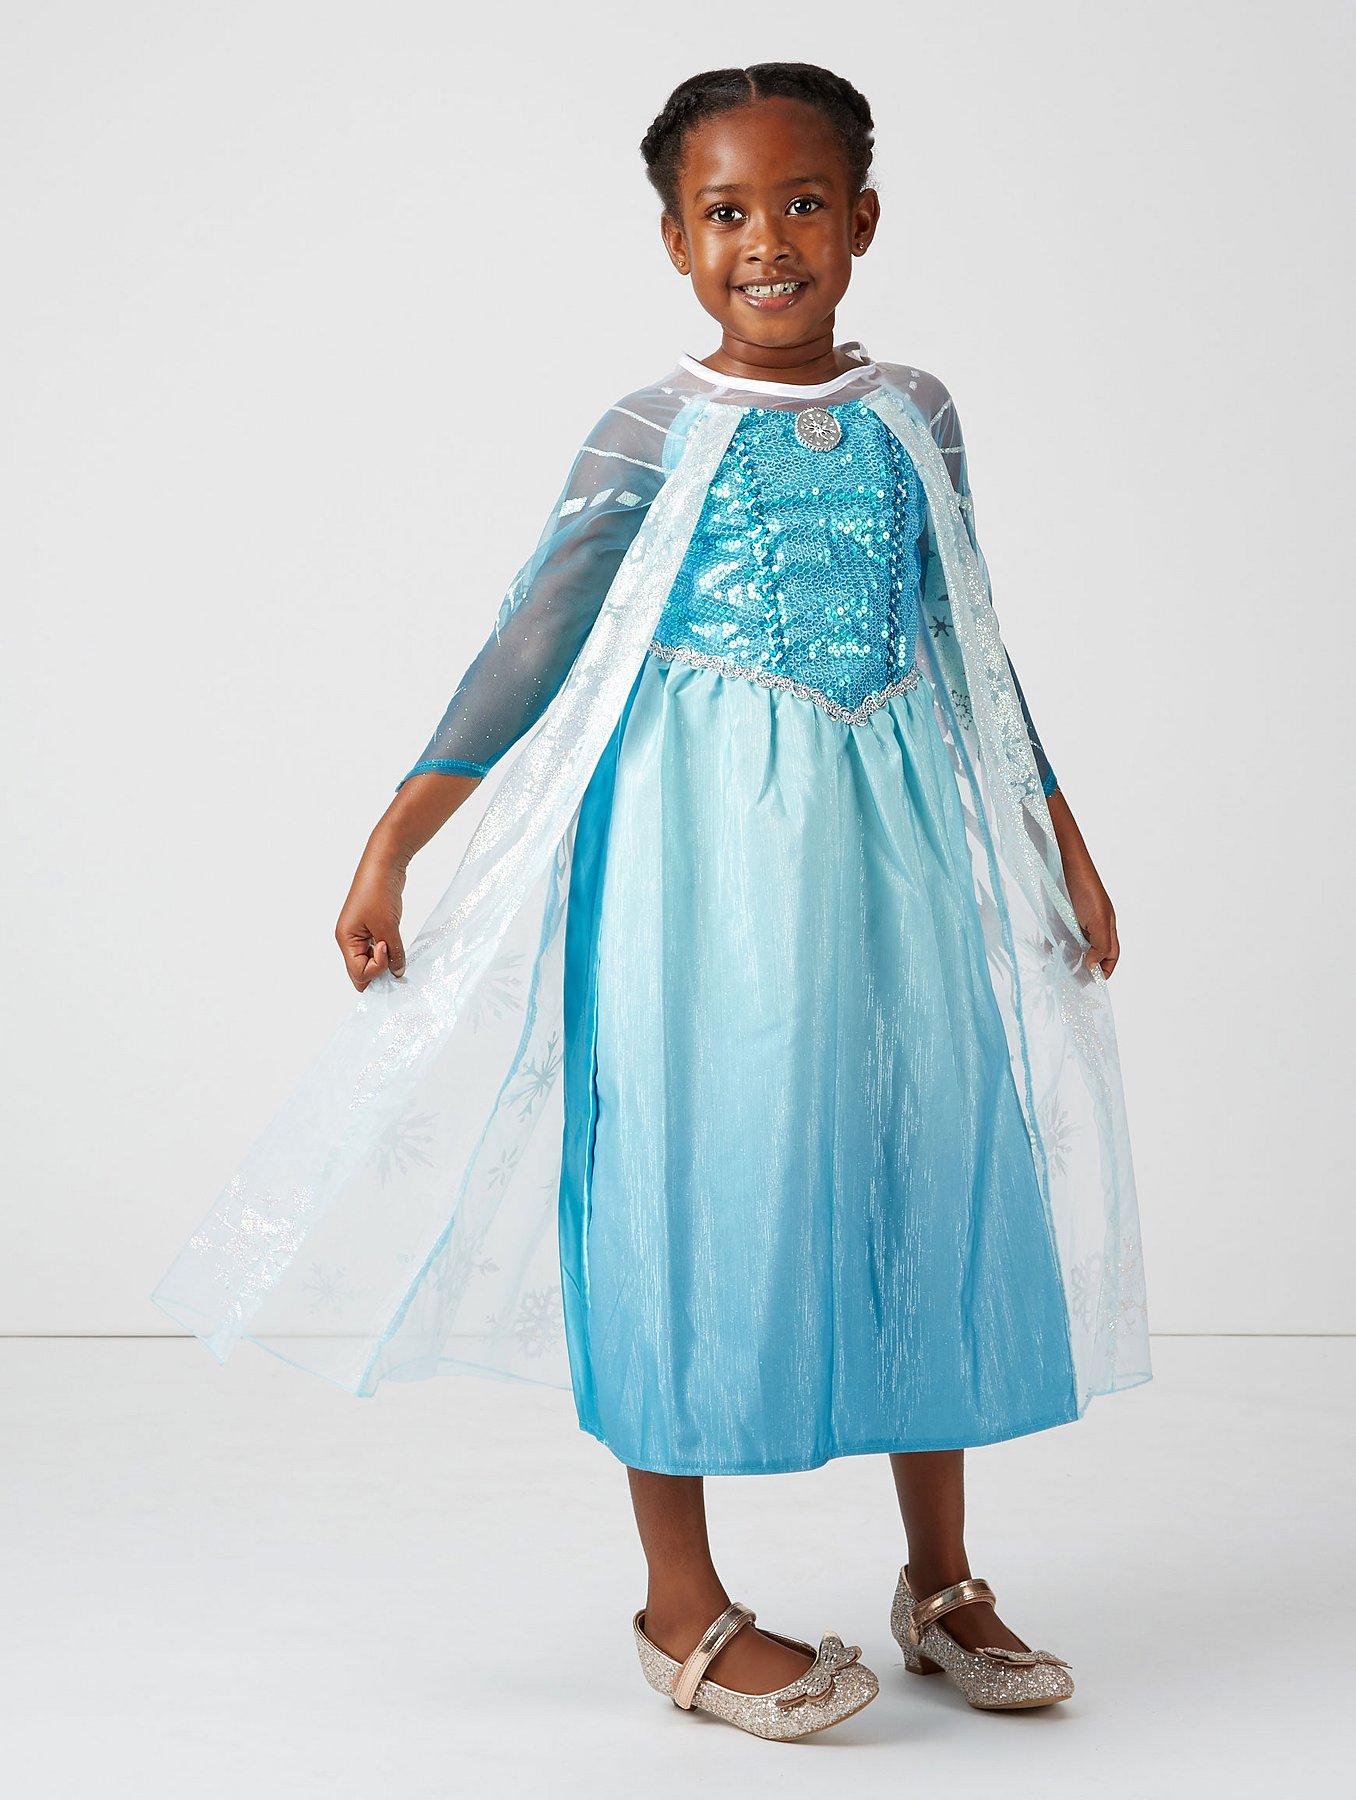 Frozen bathroom decor - Disney Frozen Elsa Fancy Dress